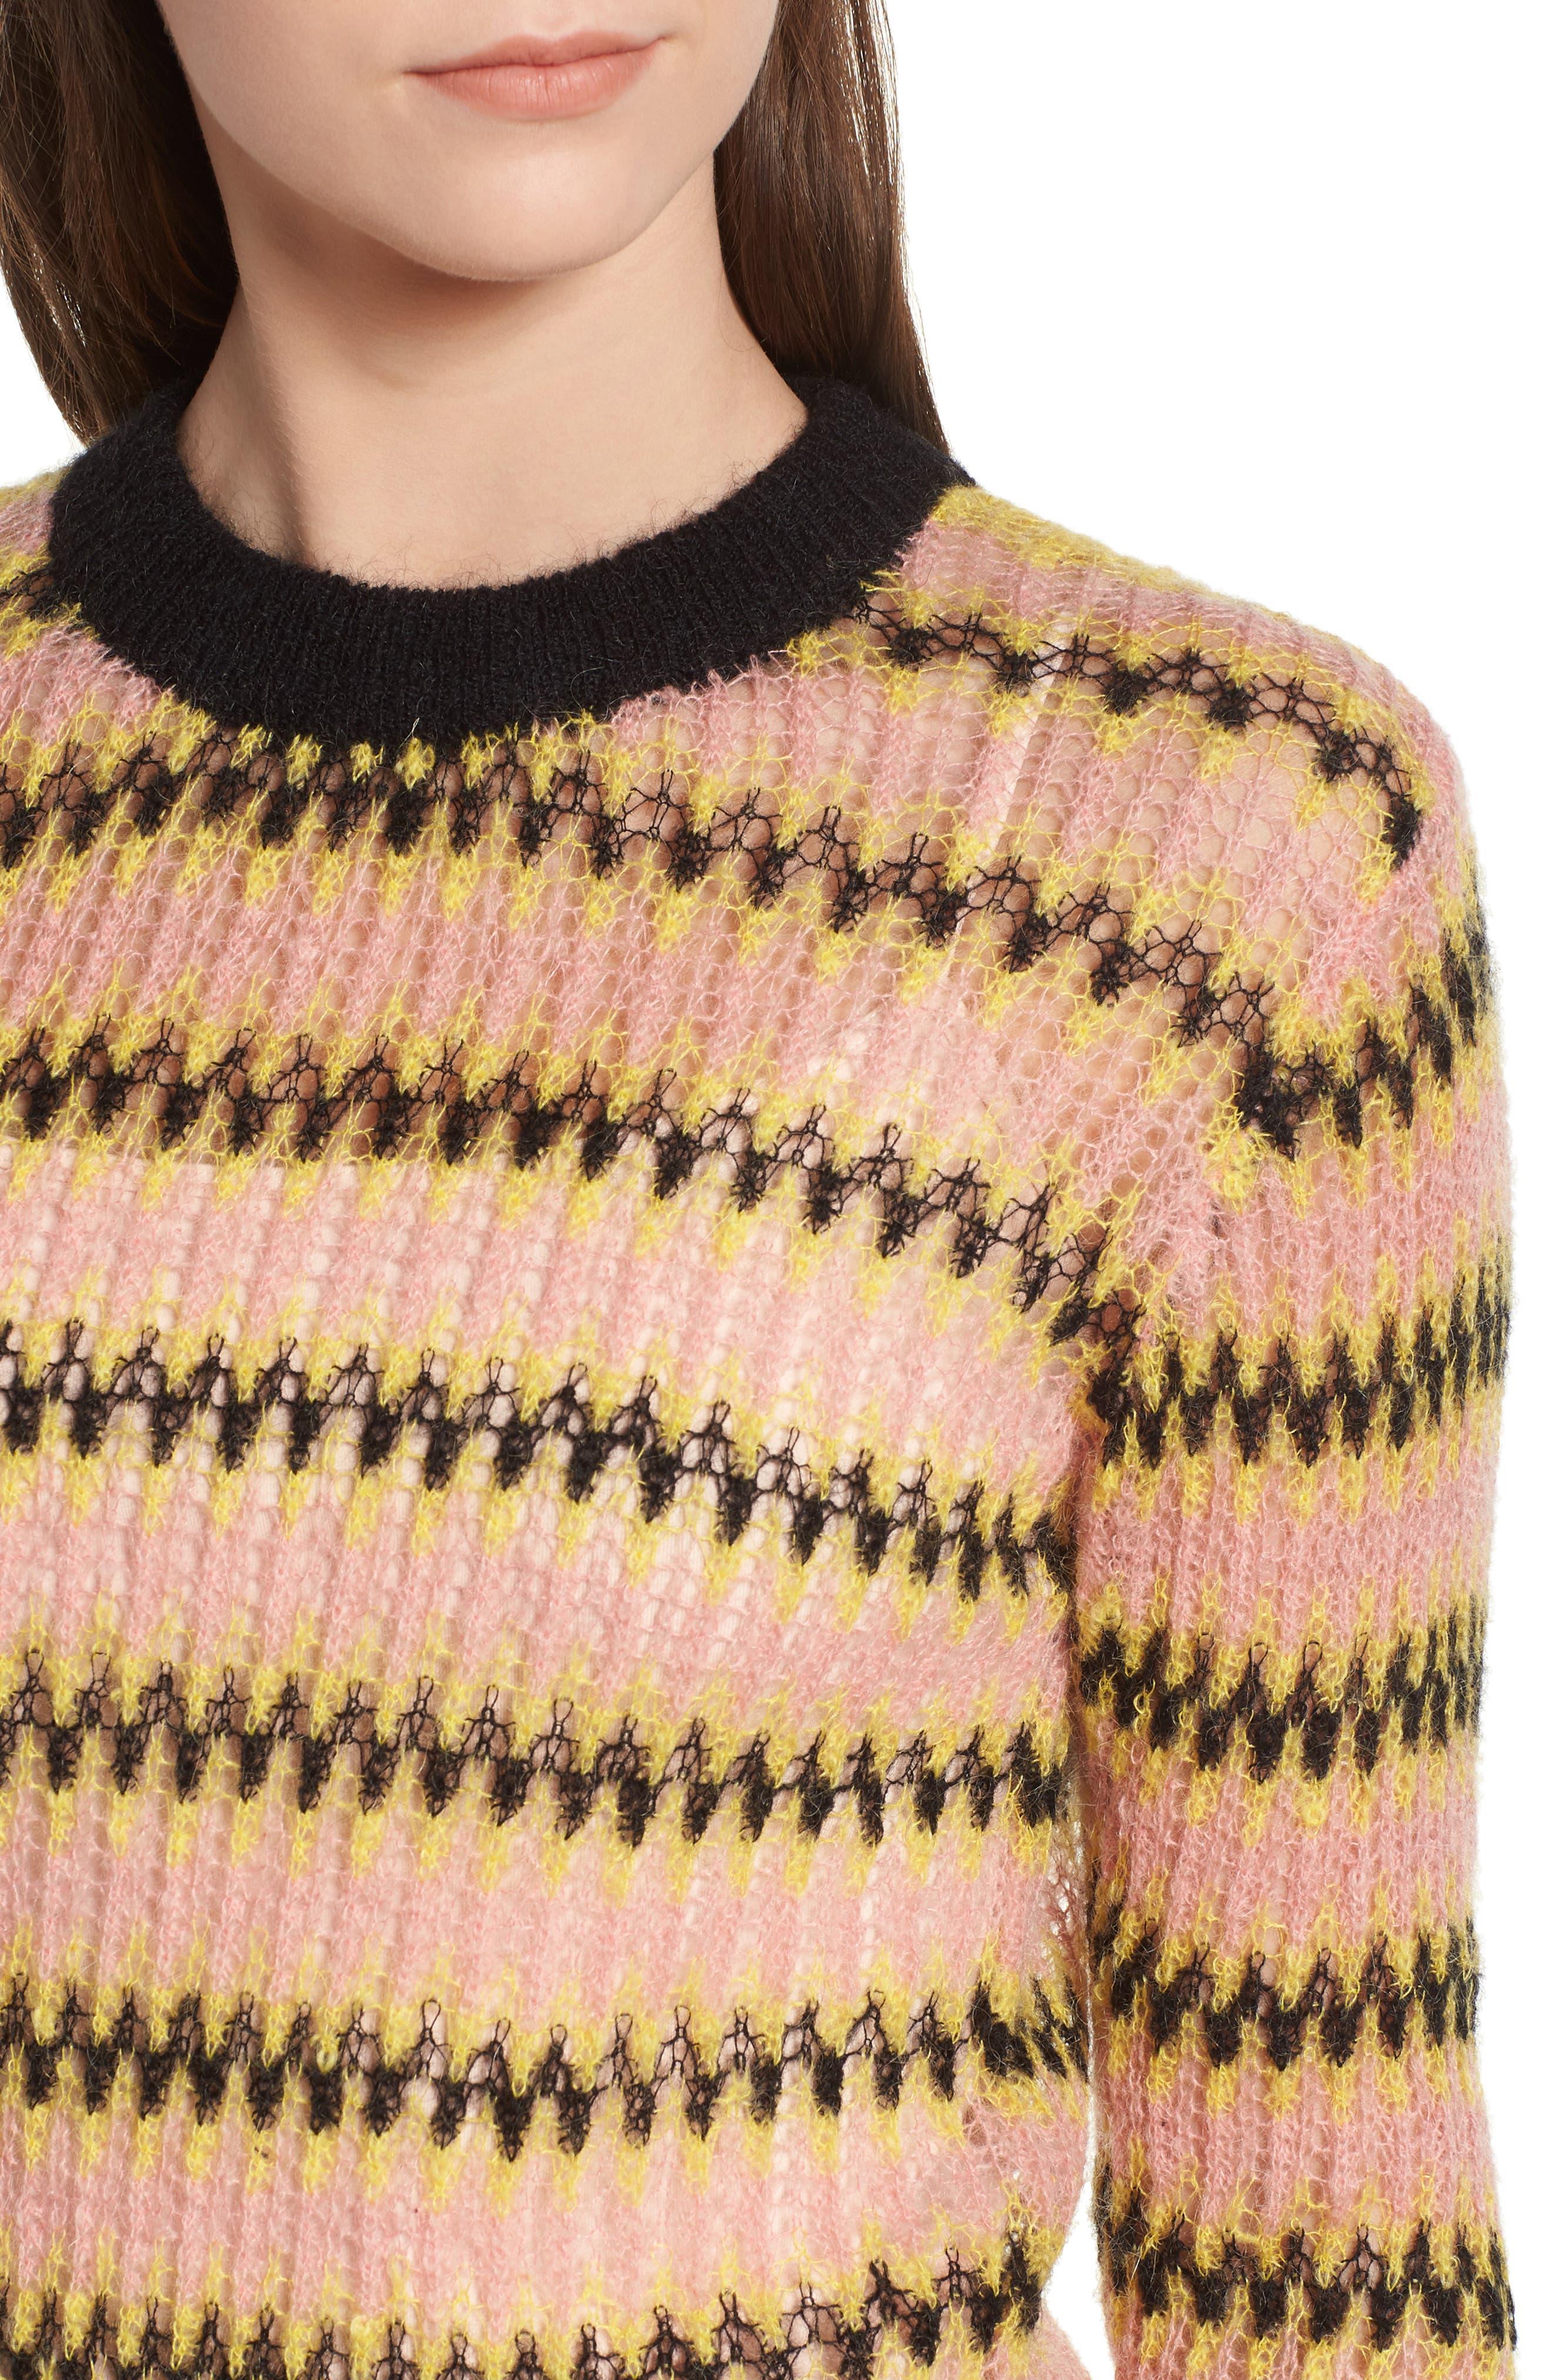 Zig Zag Wool Blend Sweater,                             Alternate thumbnail 4, color,                             MULTI PINK YELLOW ZIGZAG PRINT